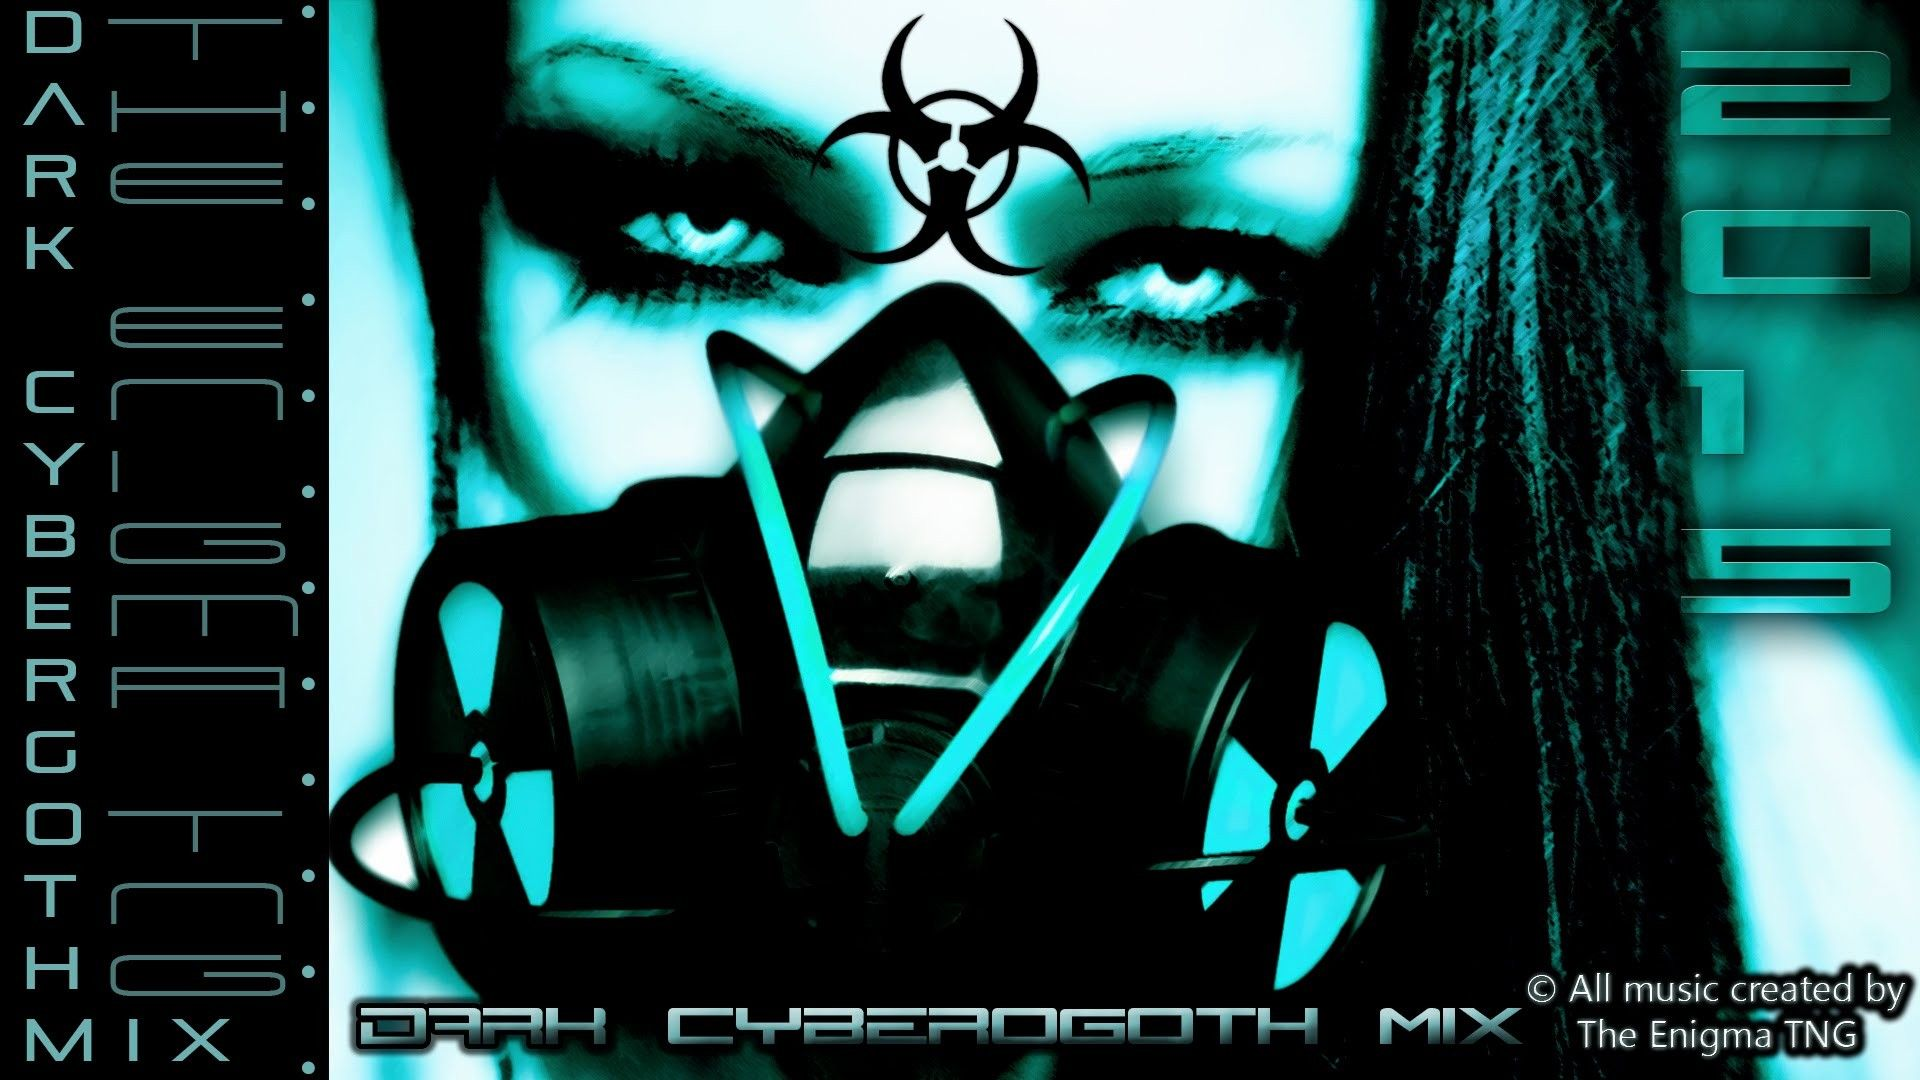 Dark cyber wallpaper subcultures wallpaper pinterest cyber dark cyber wallpaper voltagebd Images